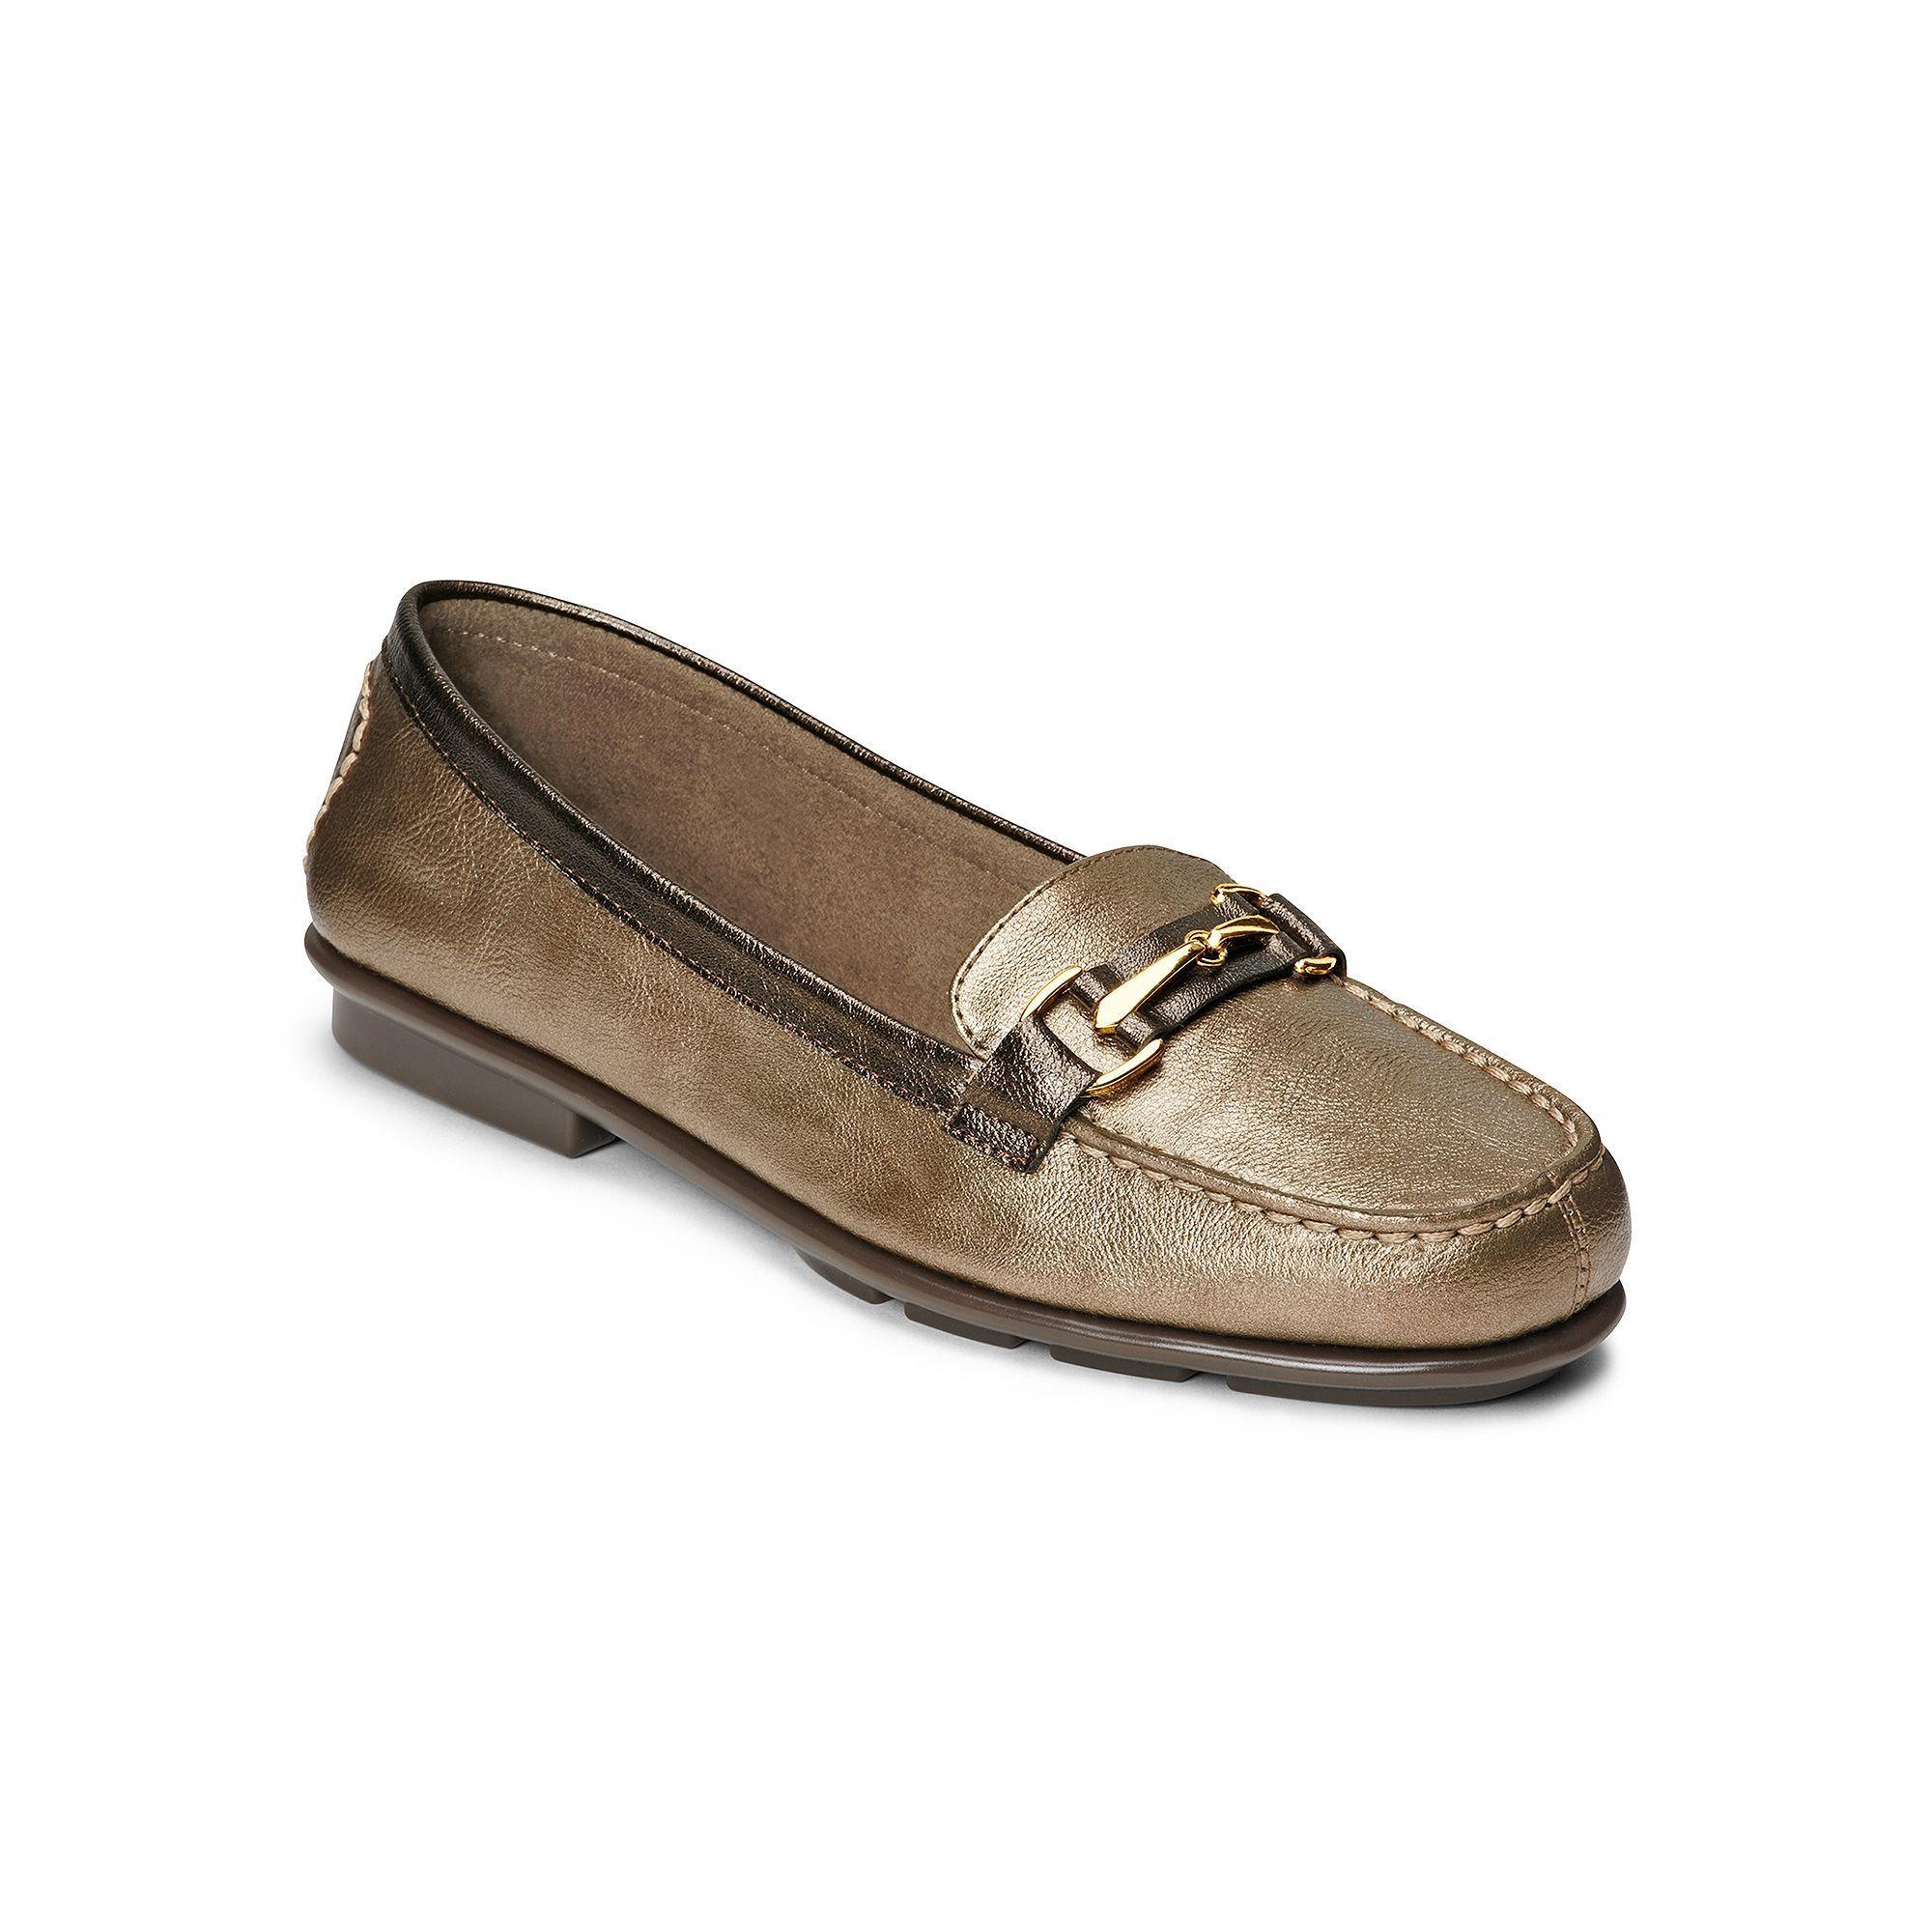 A2 by Aerosoles Stitch N Turn Nu World Womens SlipOn Loafers Size